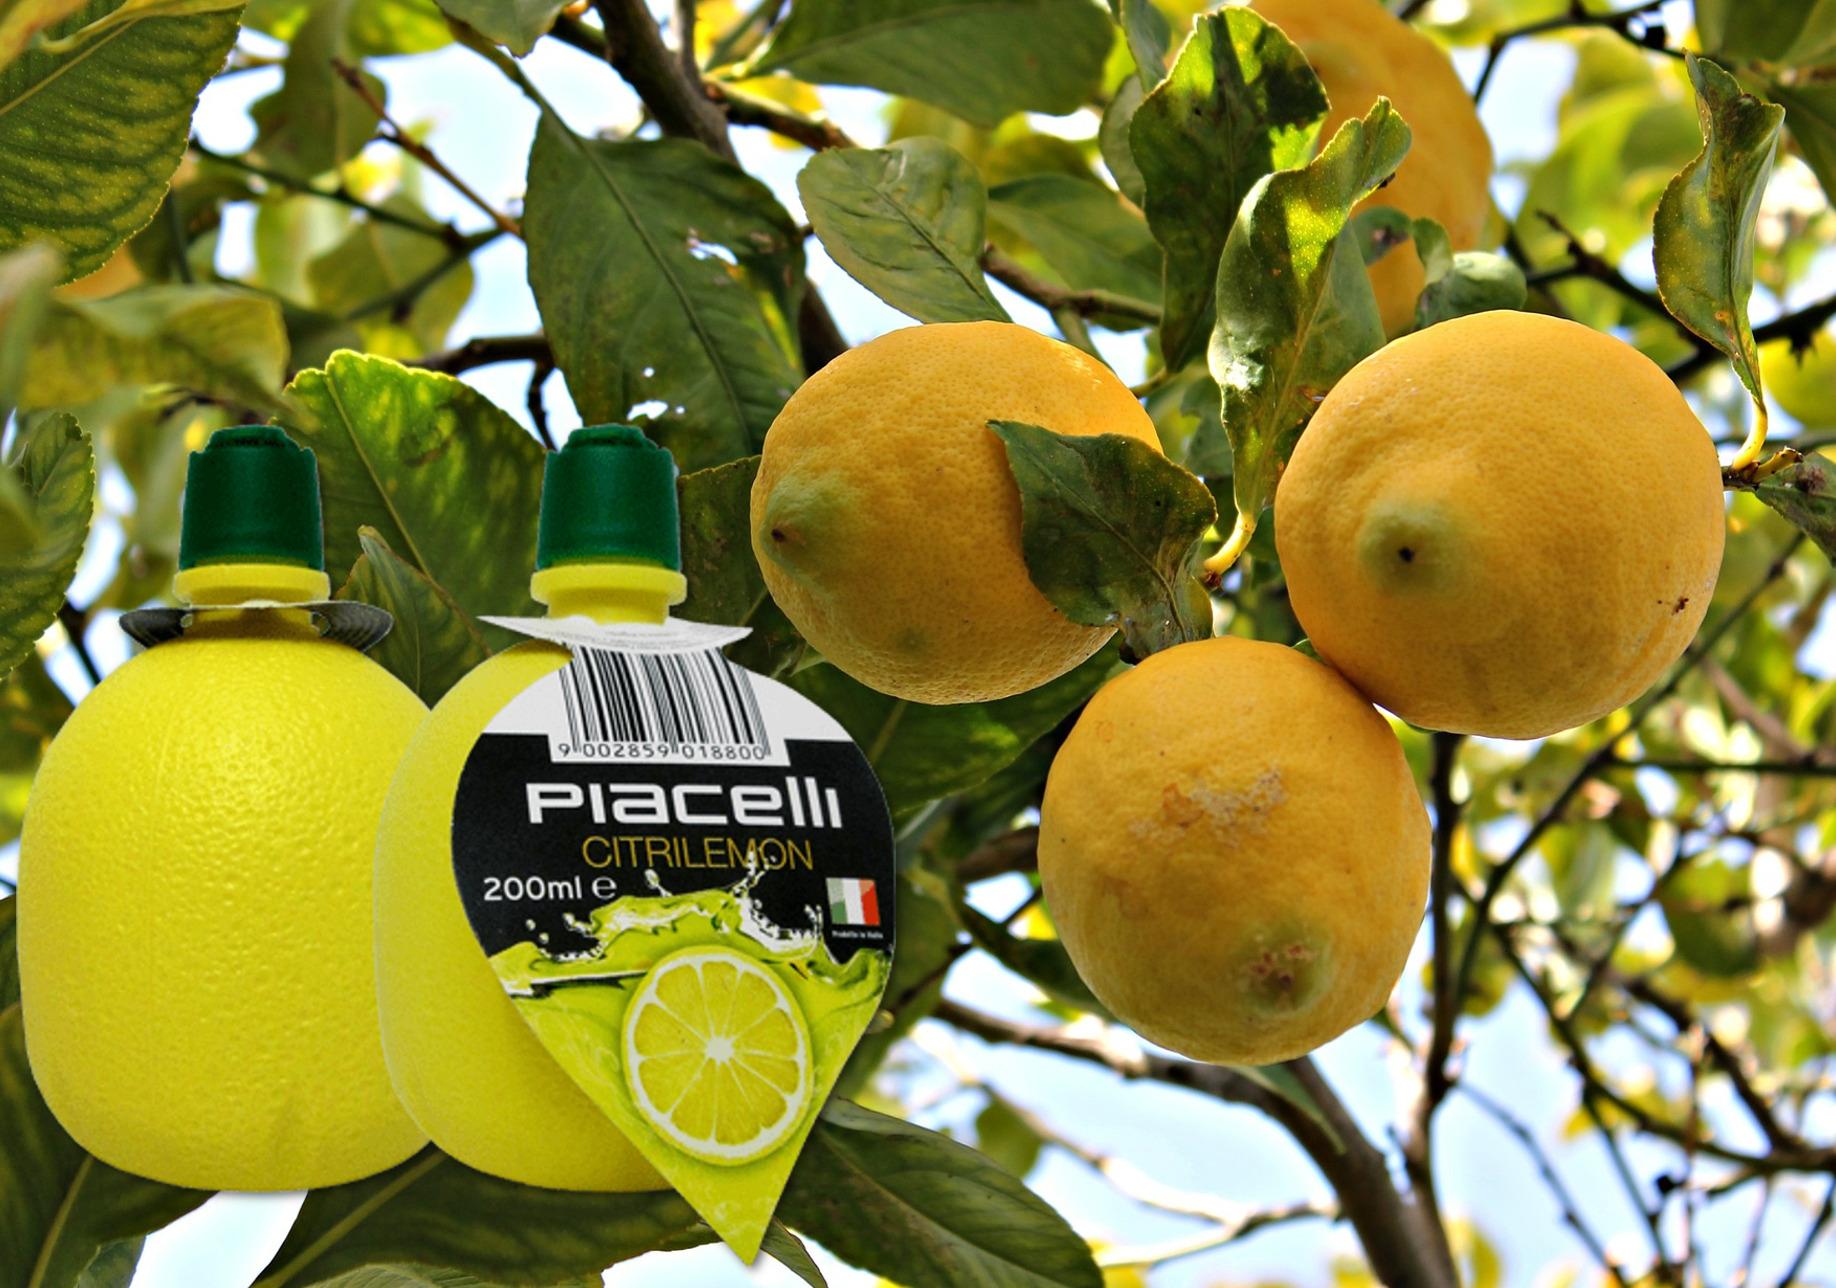 Detectan sulfitos no declarados en un zumo de limón concentrado de Piacelli Citrilemon, alerta FACUA